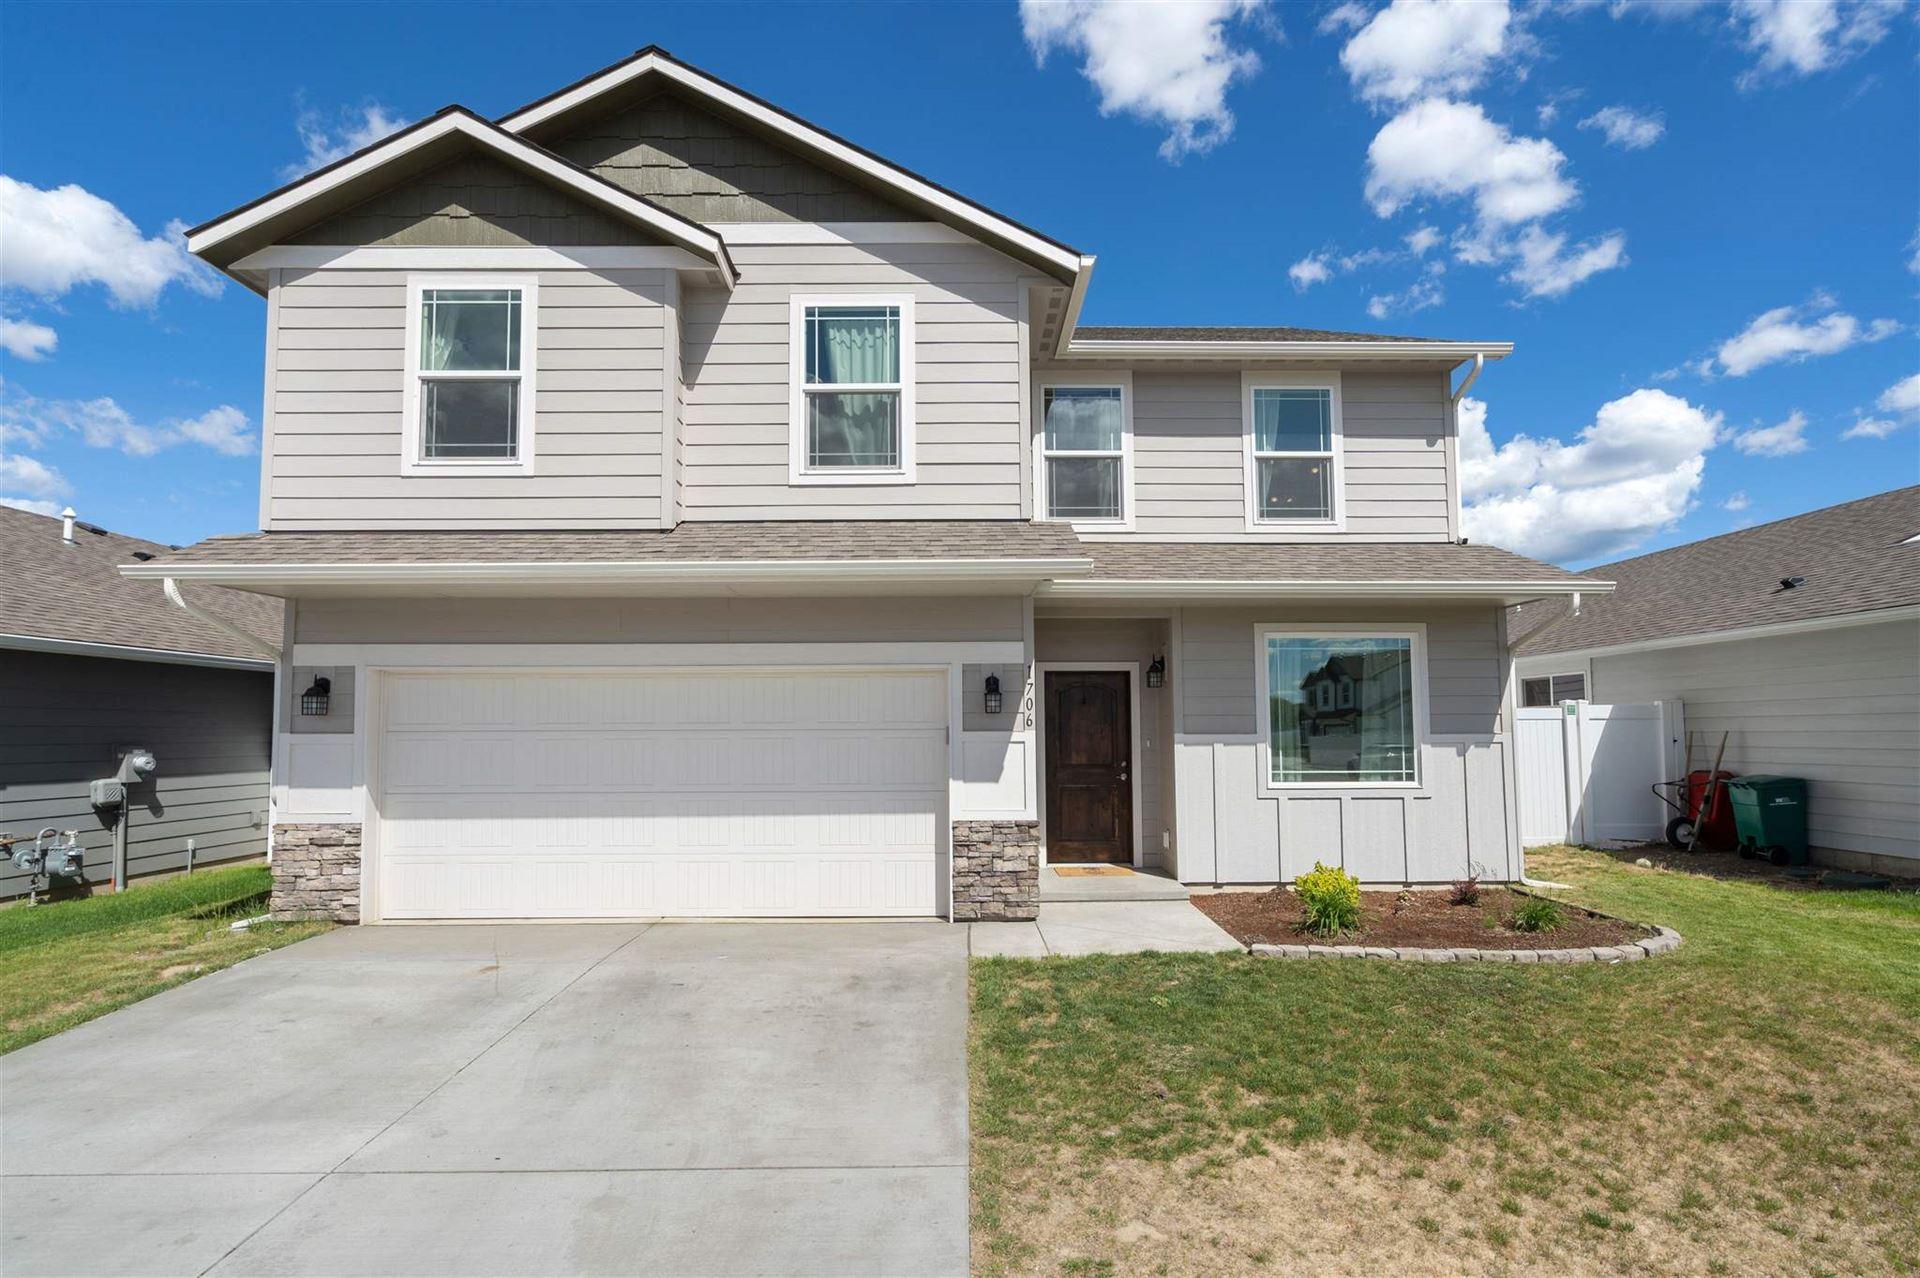 1706 N Arties Rd Rd, Spokane Valley, WA 99016 - #: 202116236